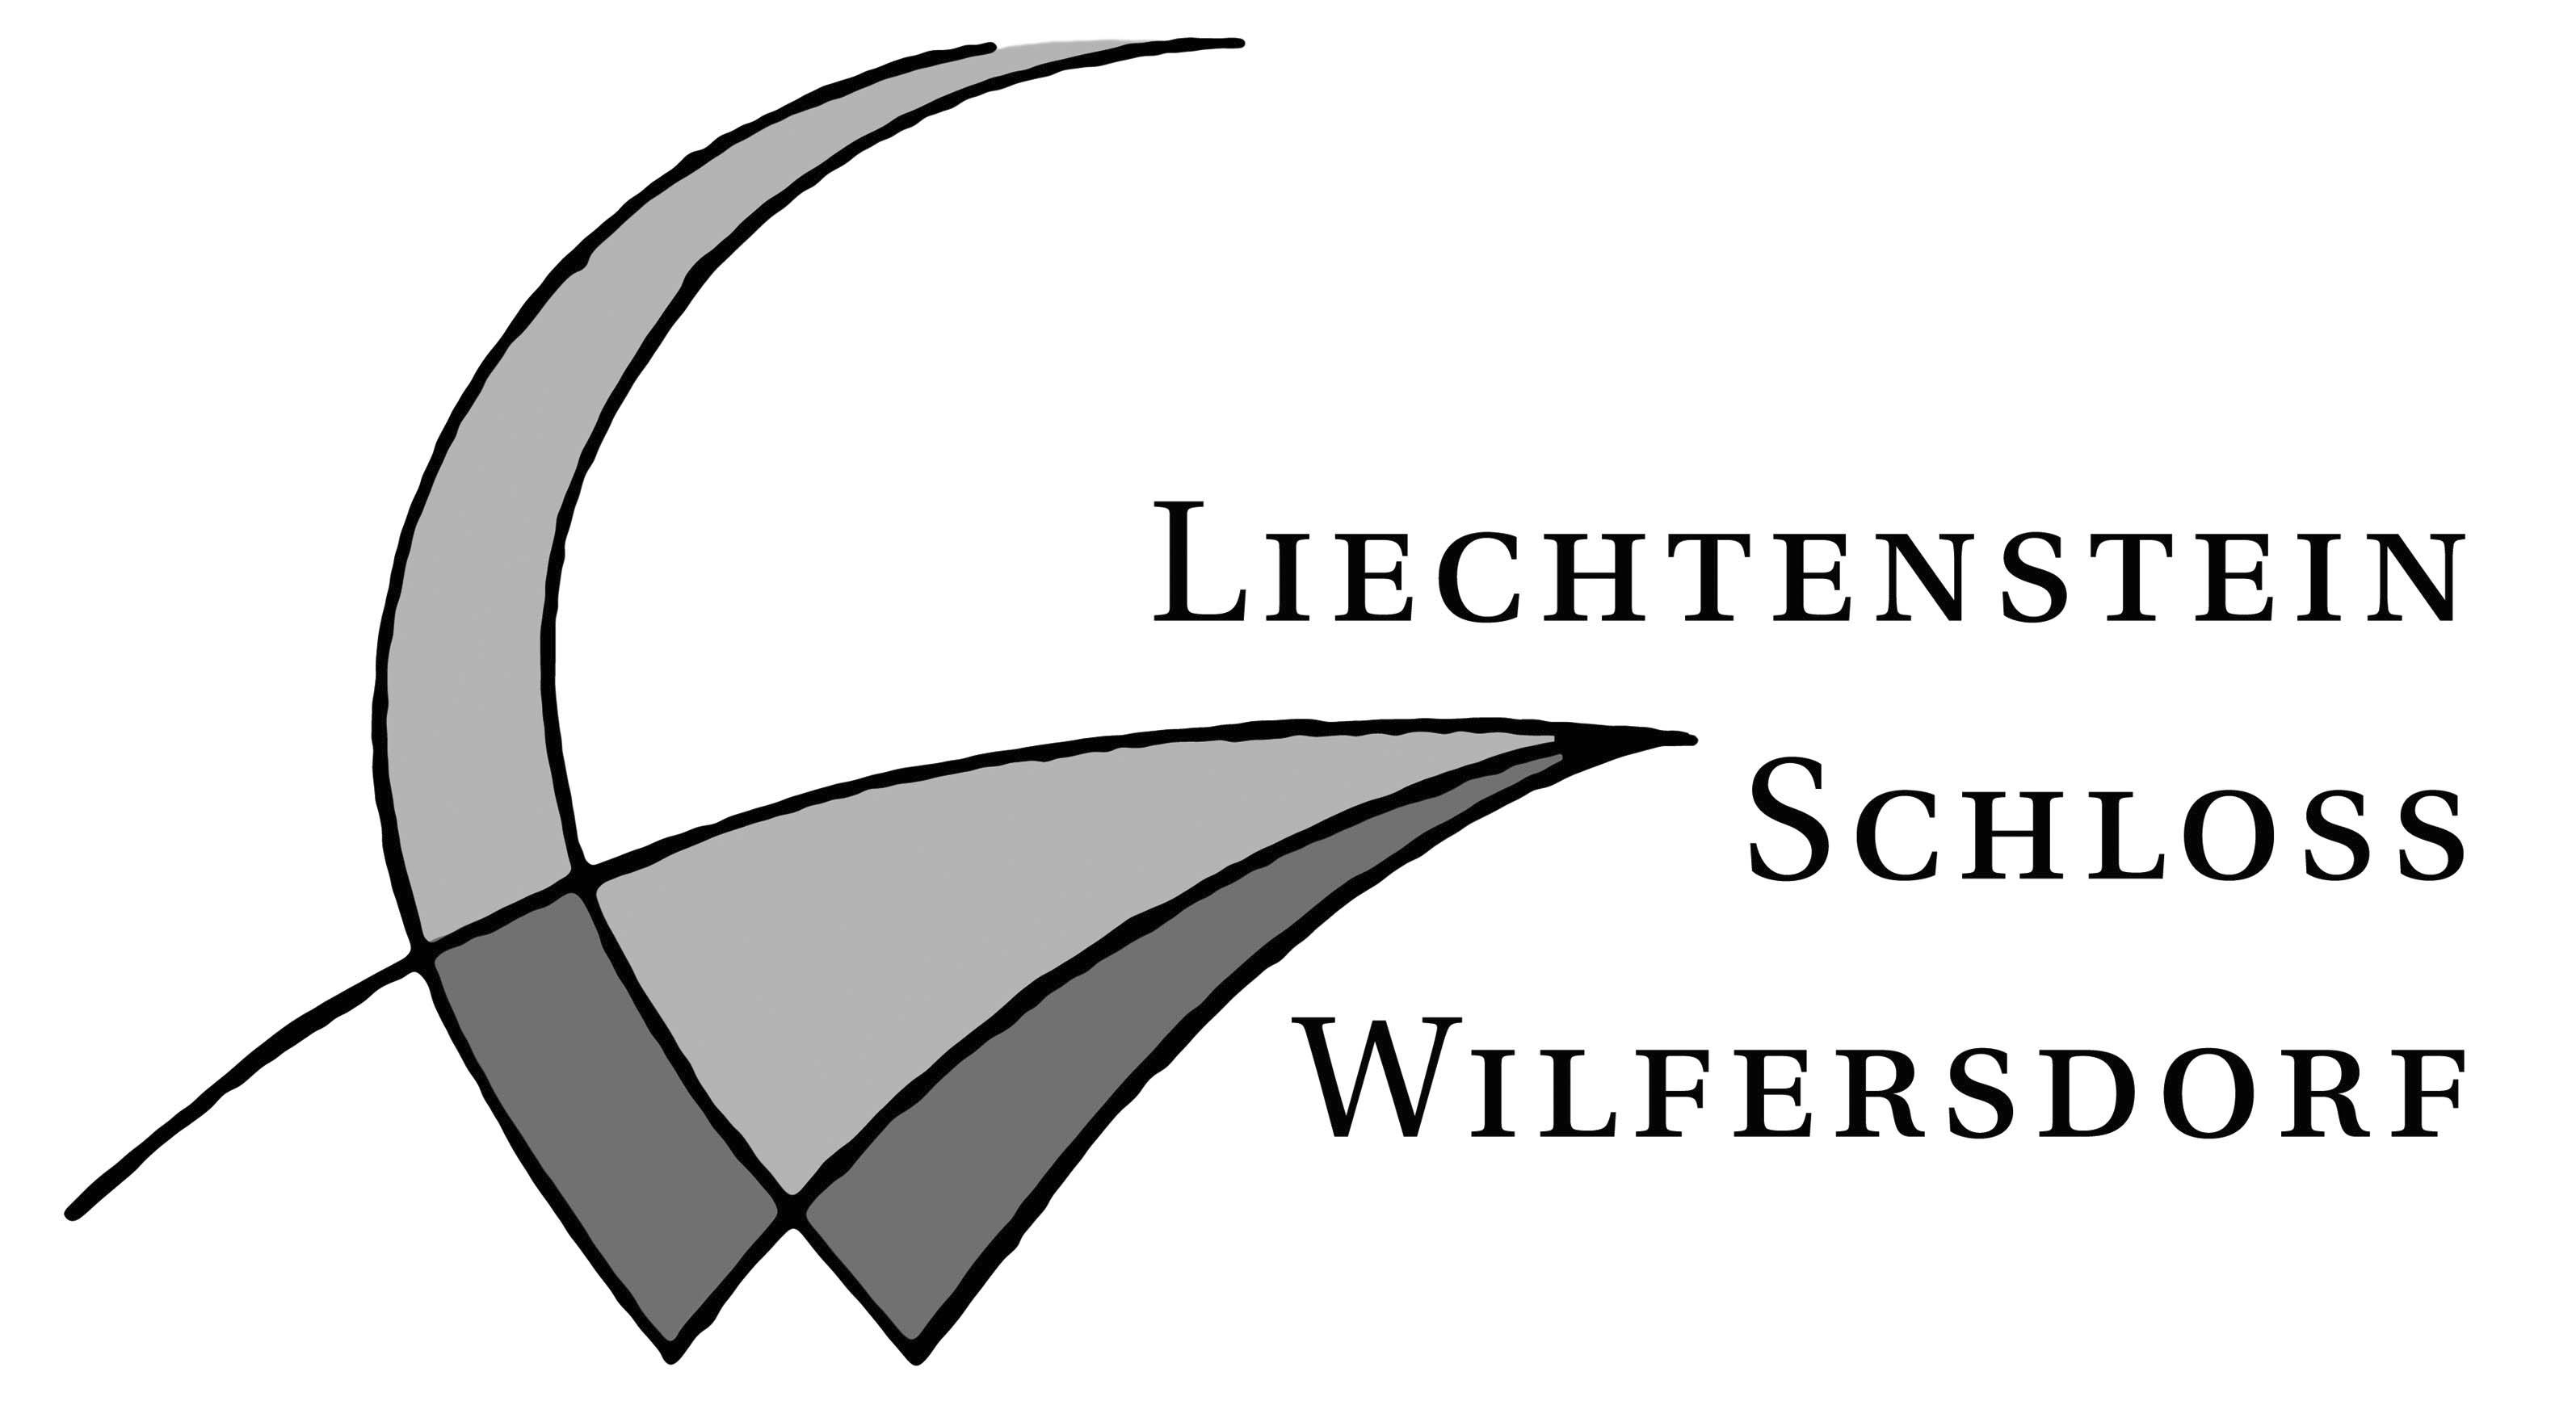 (CZ) Zámek Liechtenstein Wilfersdorf